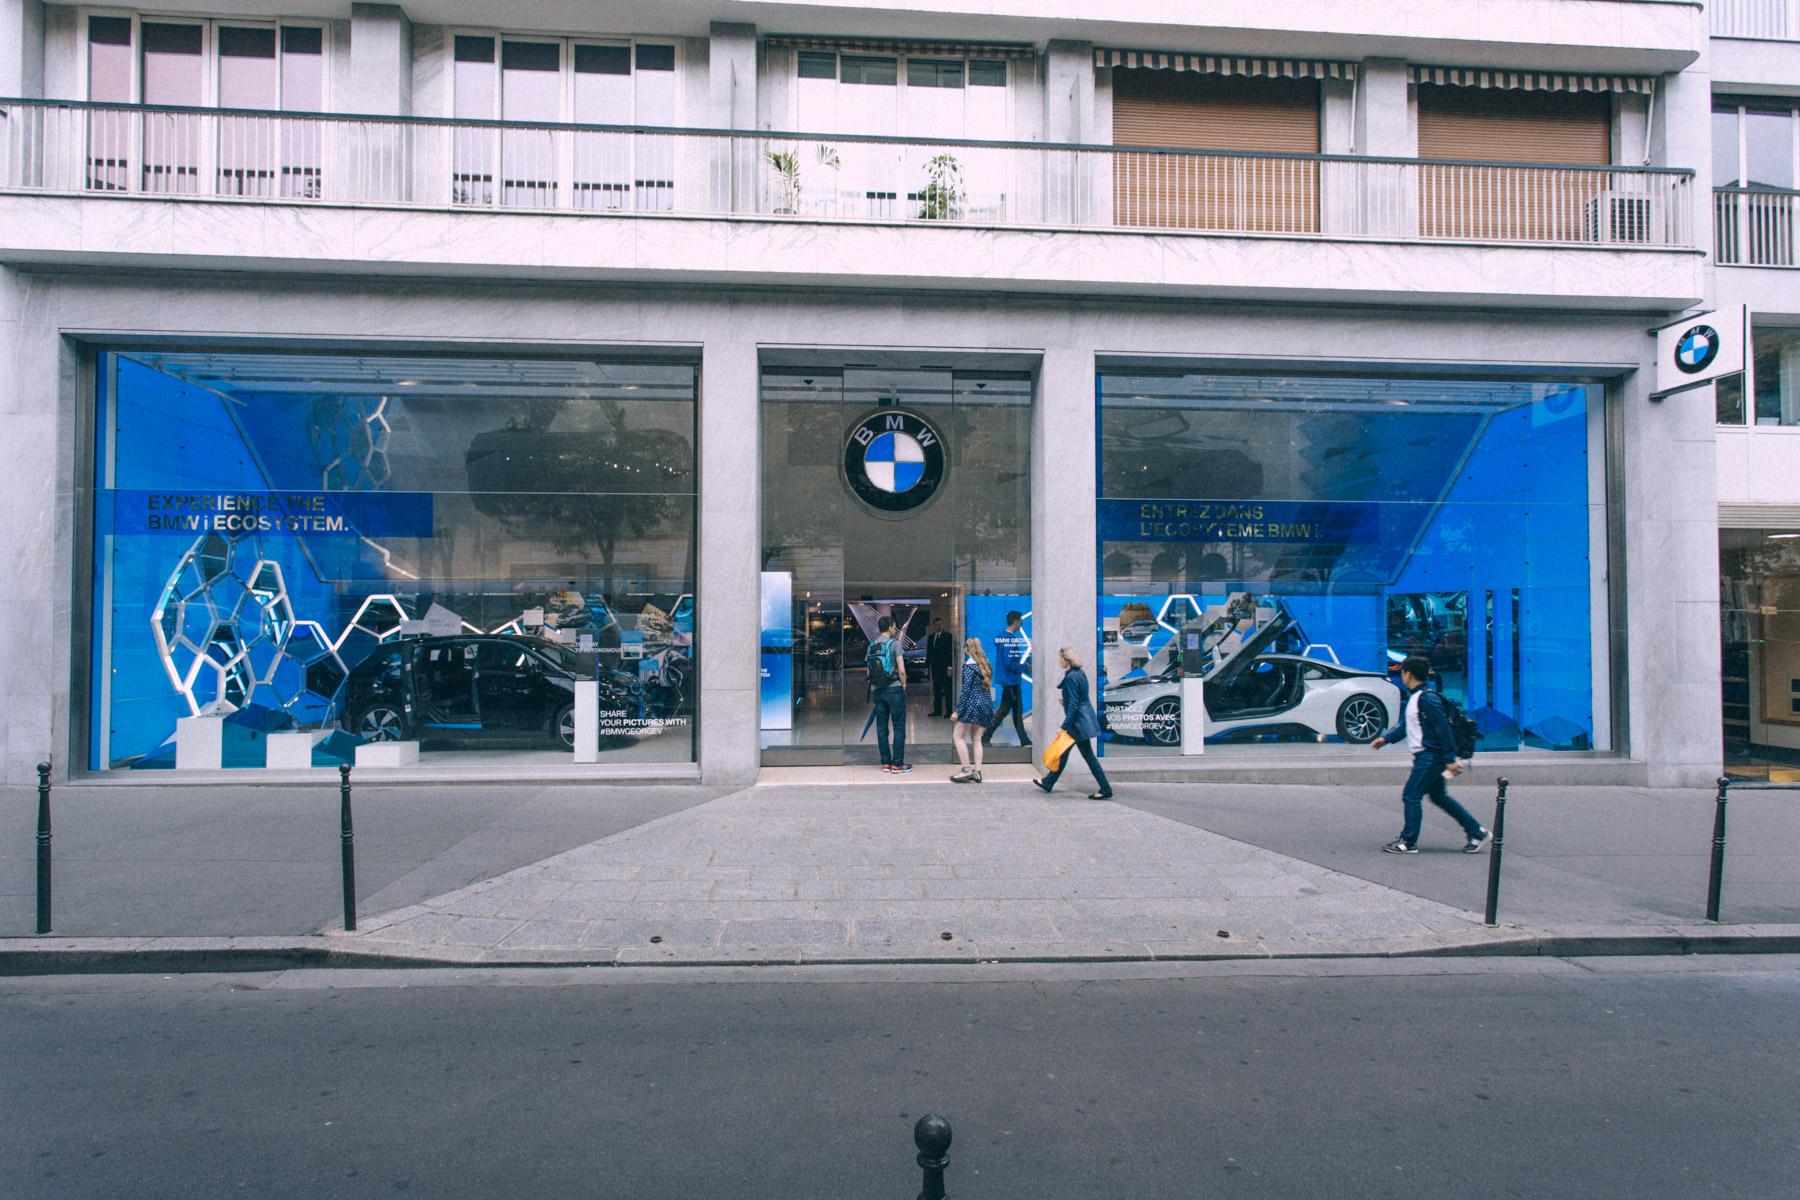 BMW George V EXPERIENCE BMW i ECOSYSYTEM WP41